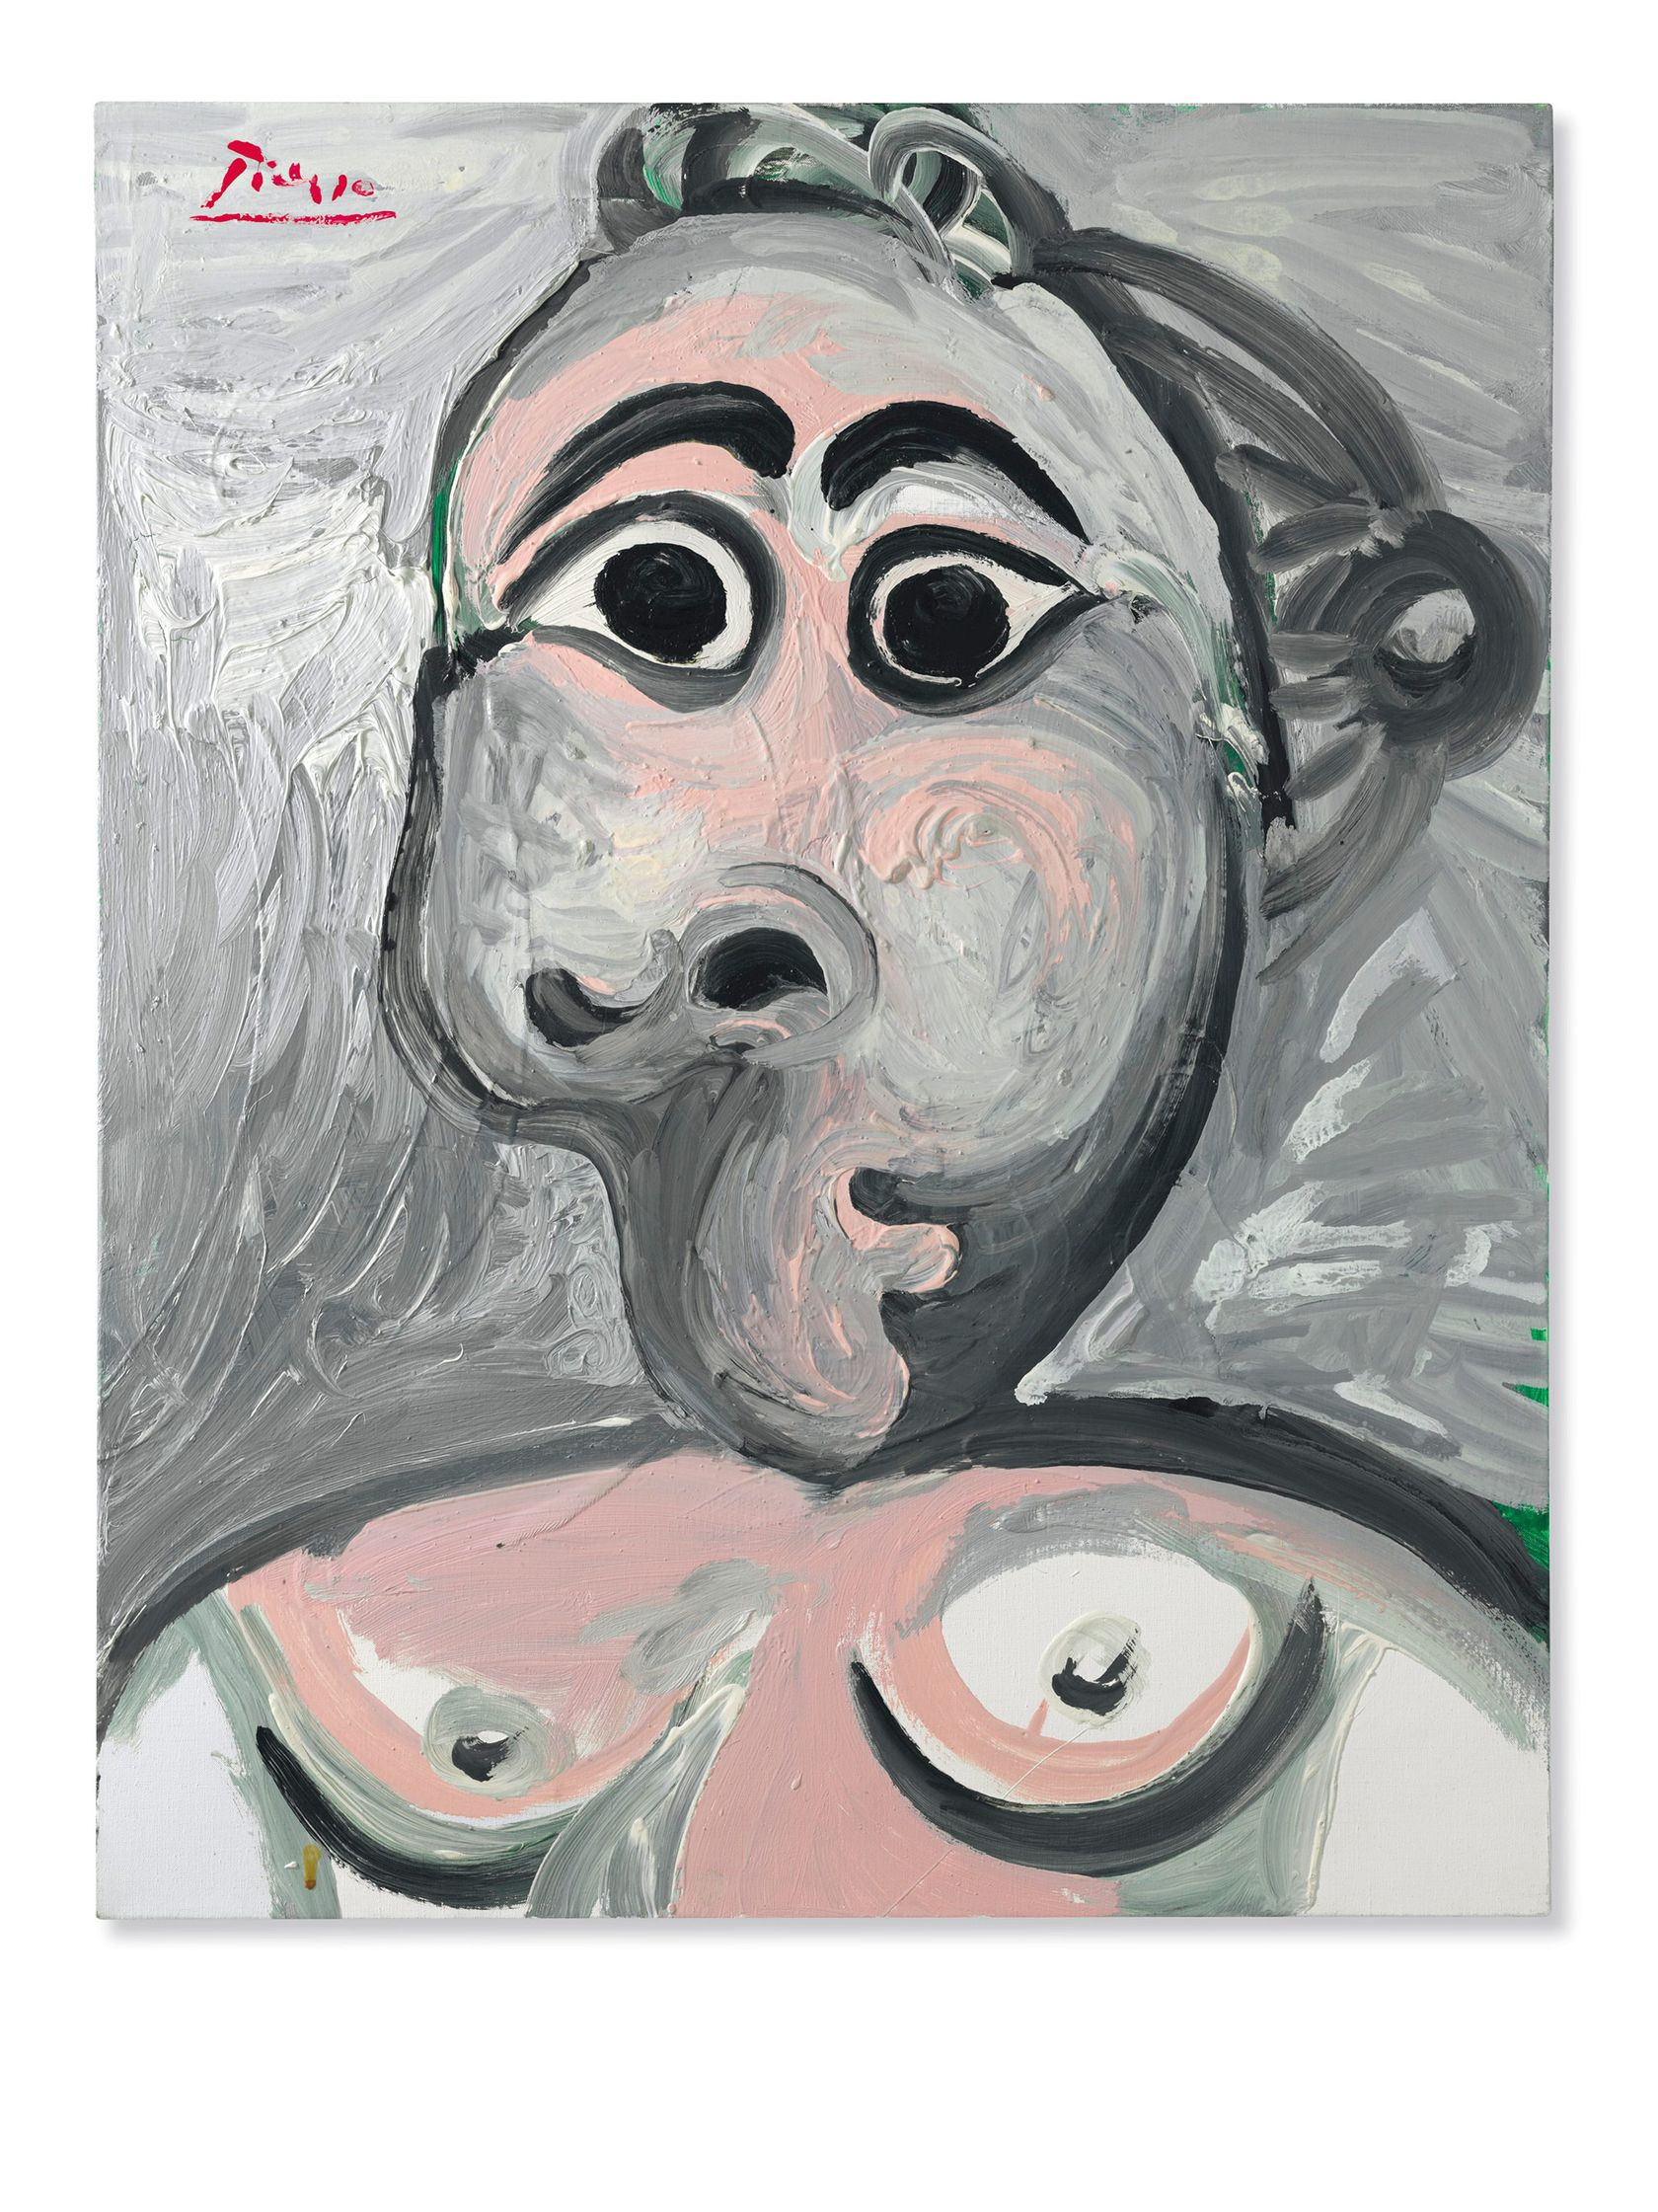 Buste de femme (1970) by Pablo Picasso. - Death in America ...